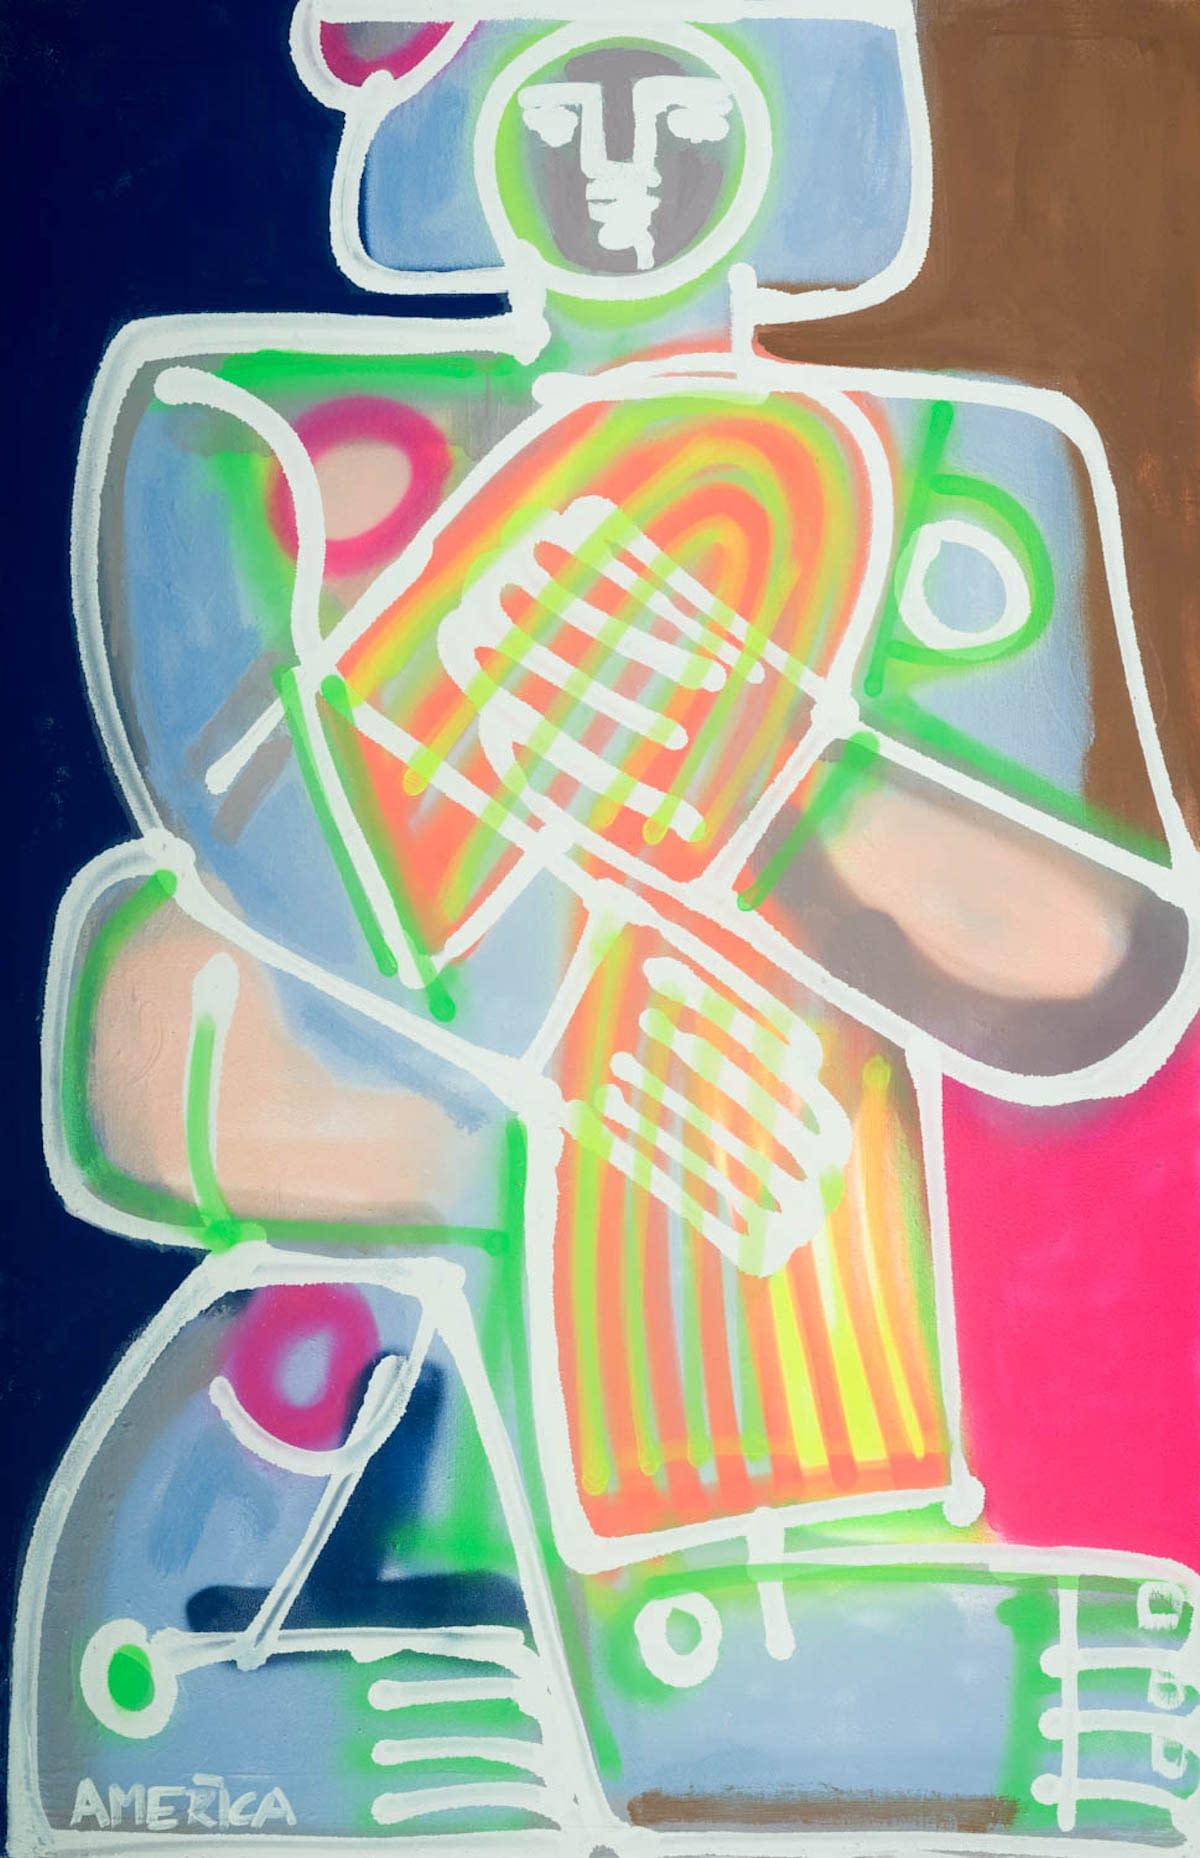 Woman_with_Orange_and_Yellow_Towel-AcrylicSprayPaintCanvas-70.5_46.5-15k